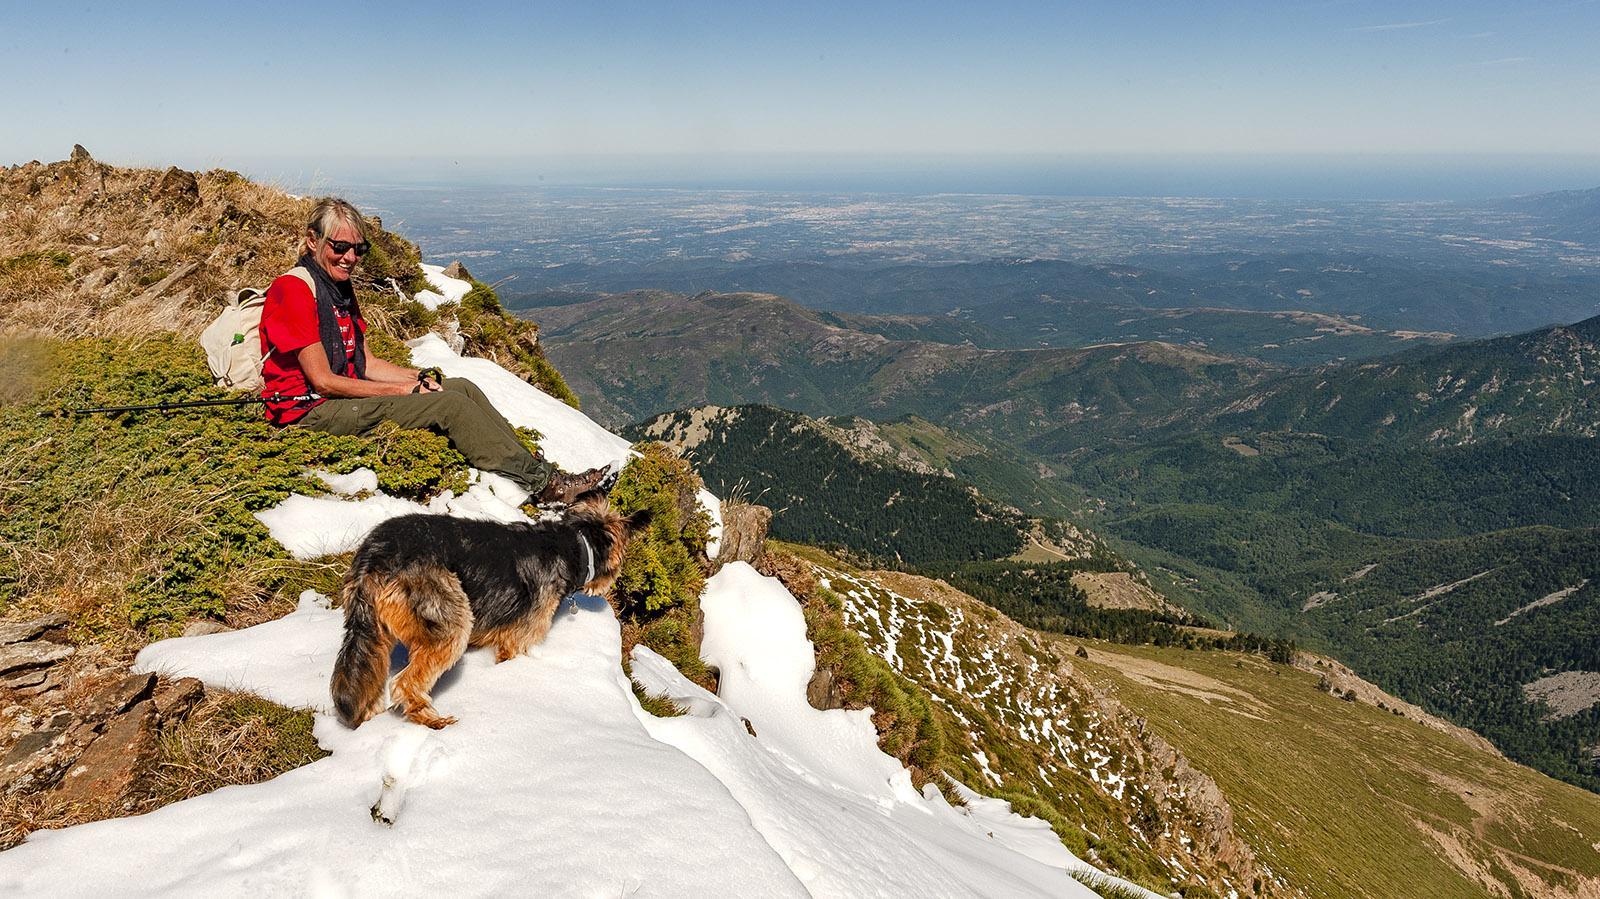 Canigo: Wanderin auf Wachholder. Foto: Hilke Maunder